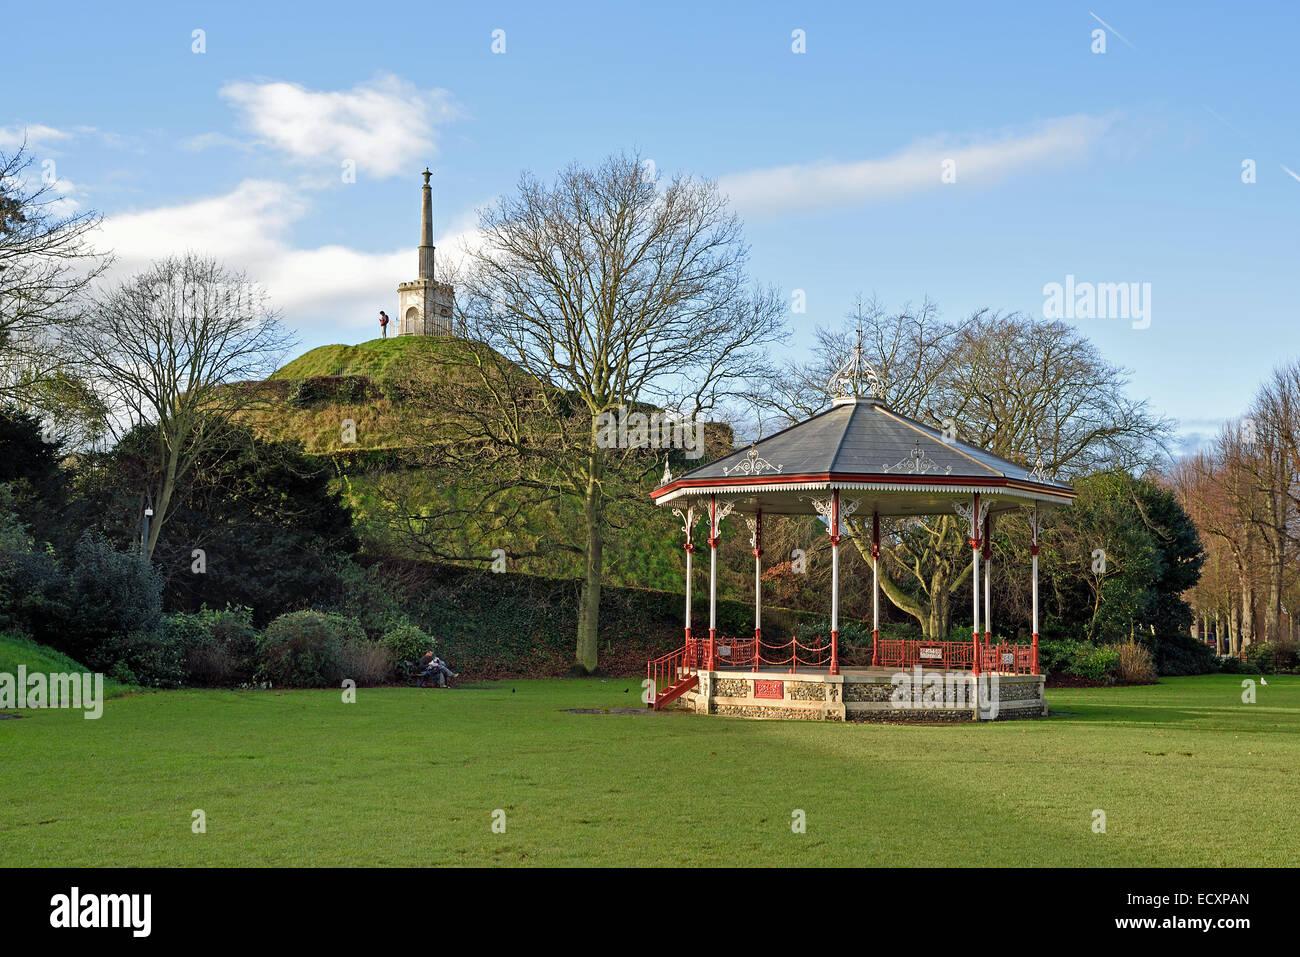 Dane John Mound and the Victorian bandstand in Dane John Gardens, Canterbury, Kent, UK - Stock Image